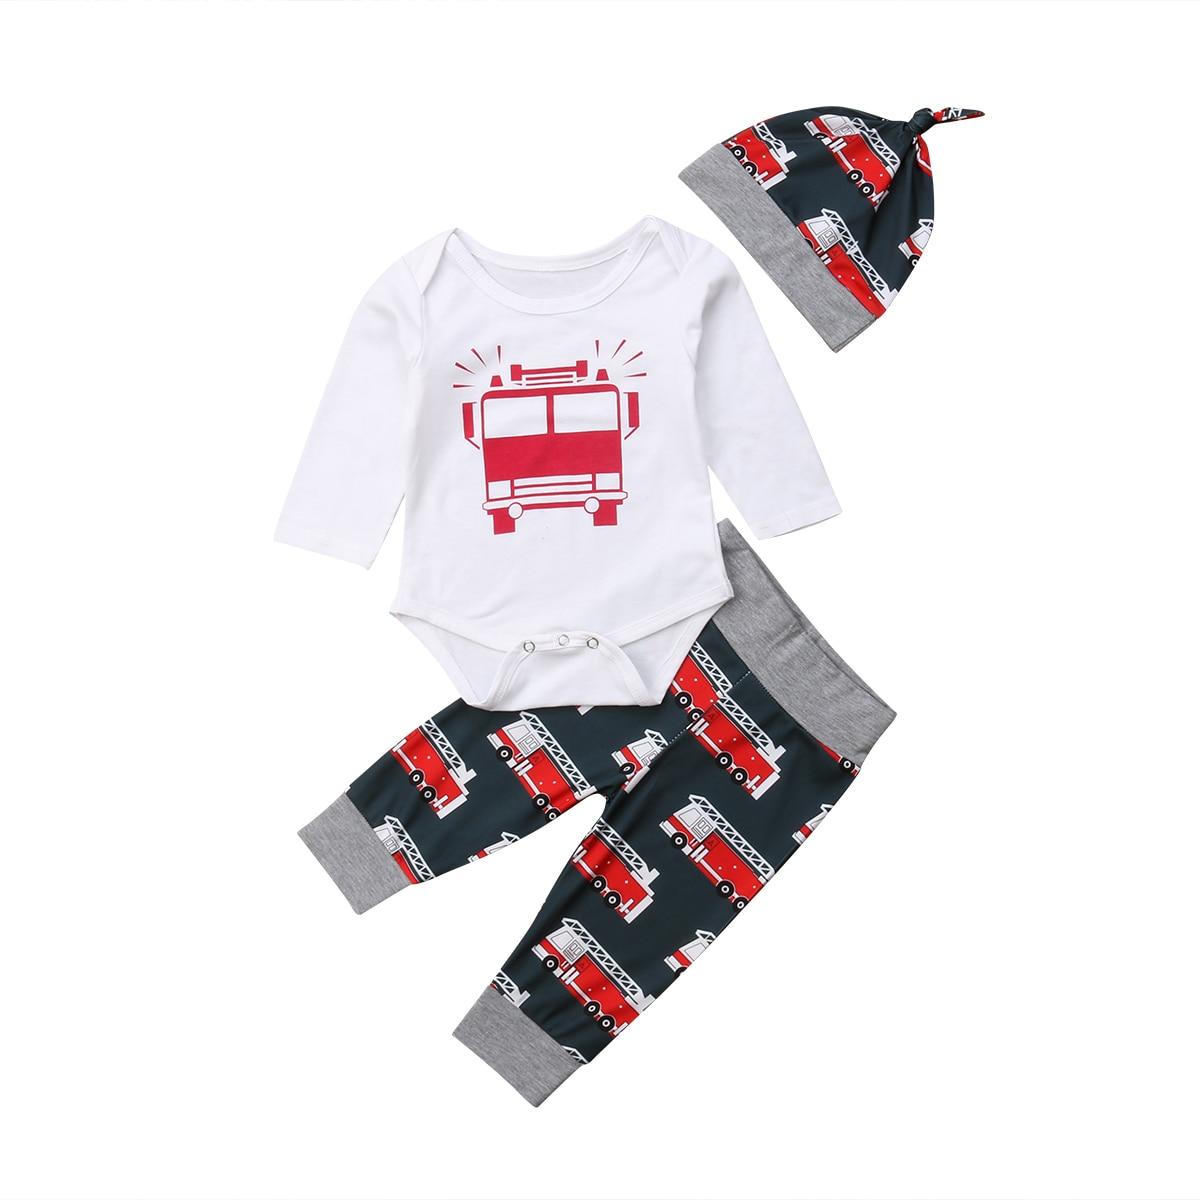 0-18M Infant Newborn Baby Boy Long Sleeve Cotton Romper Tops+Bus Print Long Pant Trouser Hat 3PCS Outfits Clothing Set